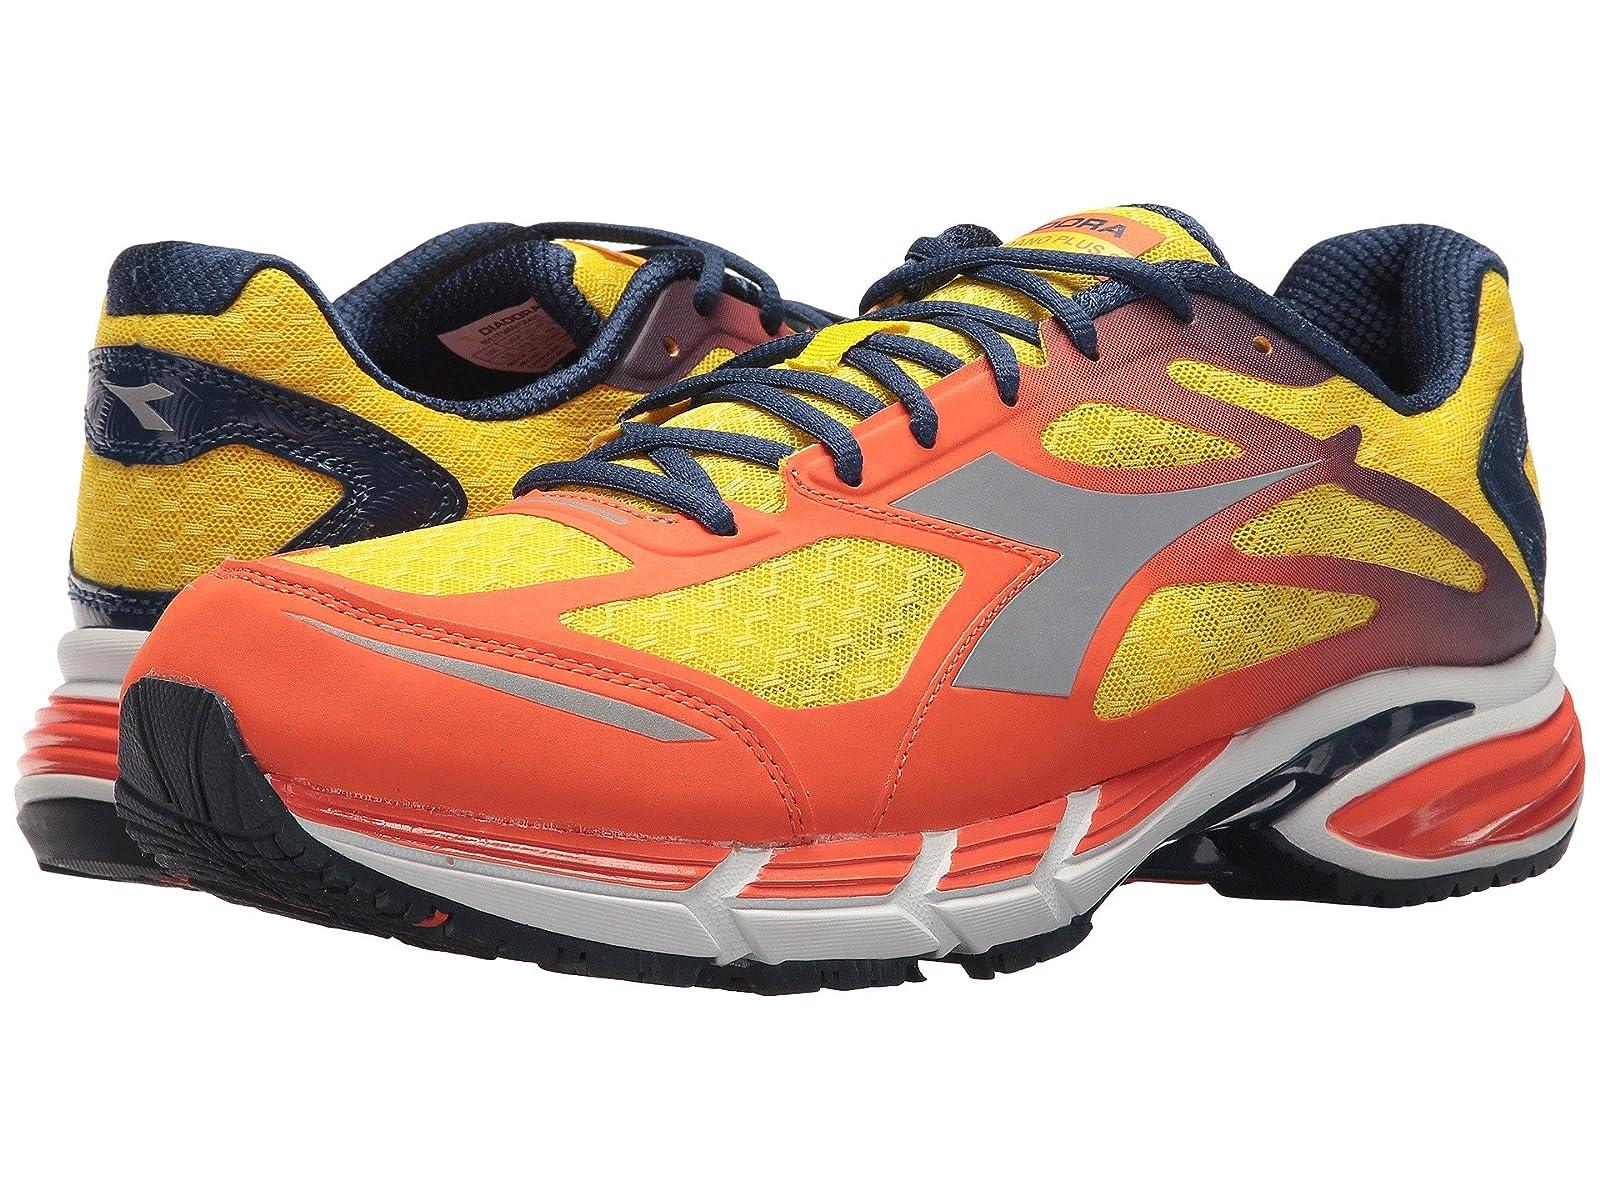 Diadora M.Shindano Plus 2Cheap and distinctive eye-catching shoes